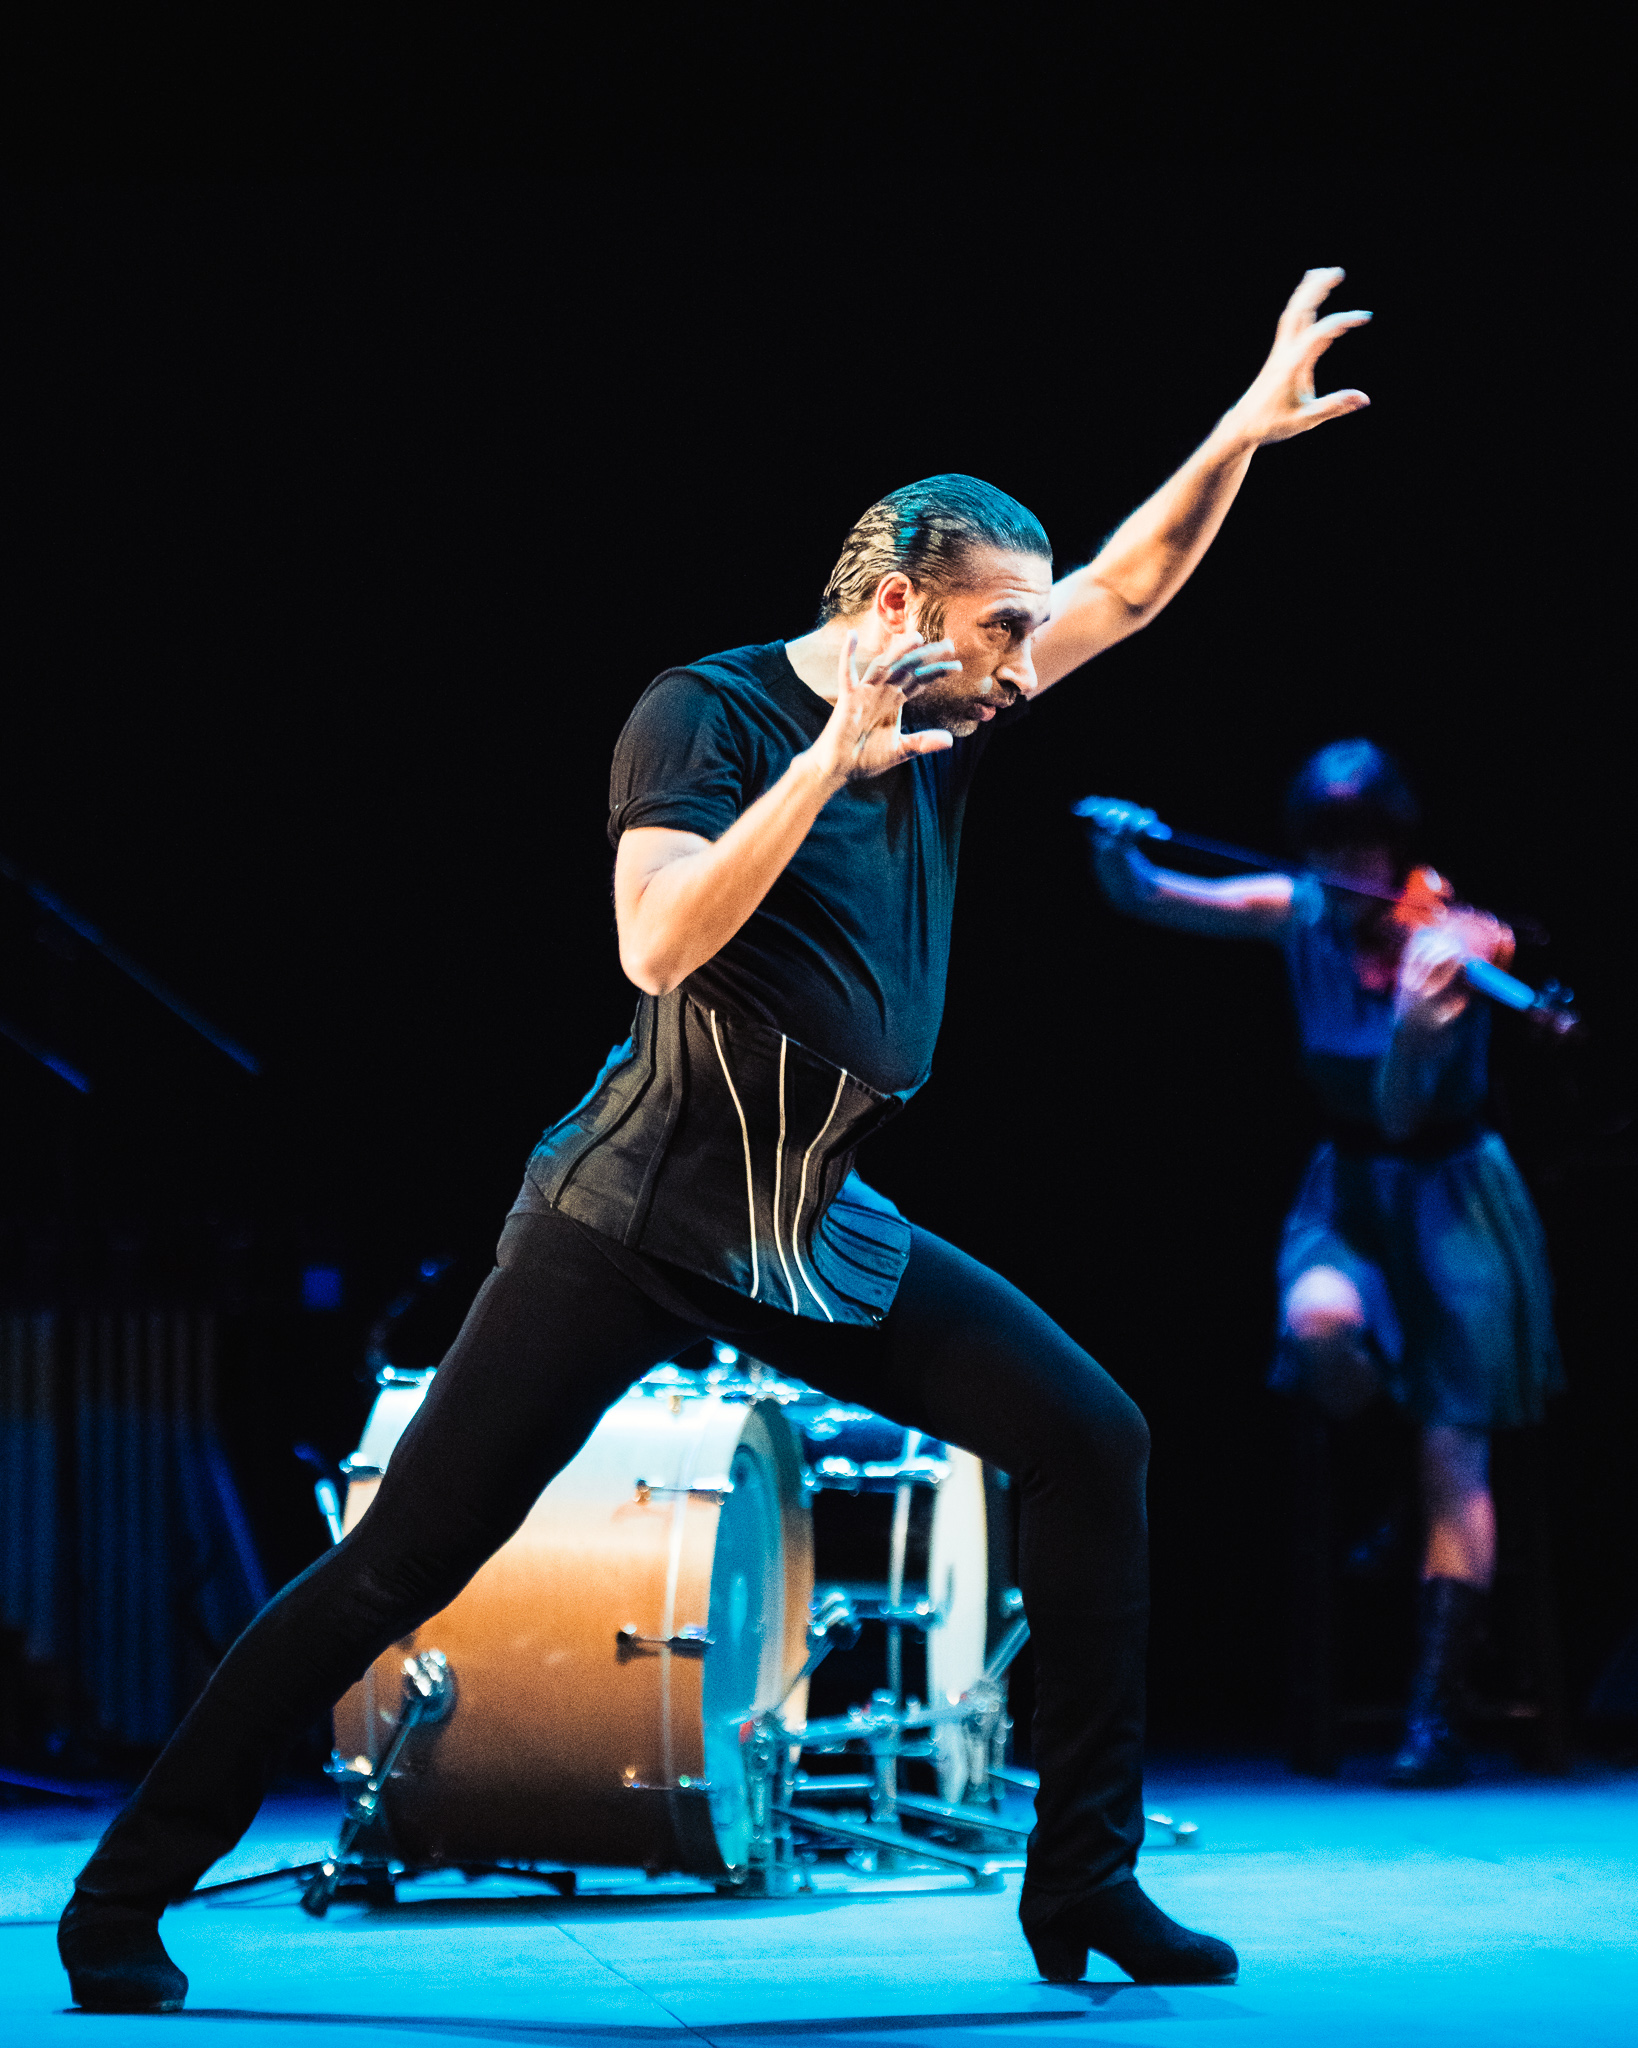 Israel Galván dance photography, fotografia de escena, fotografo de danza, dance photographer, stage photography